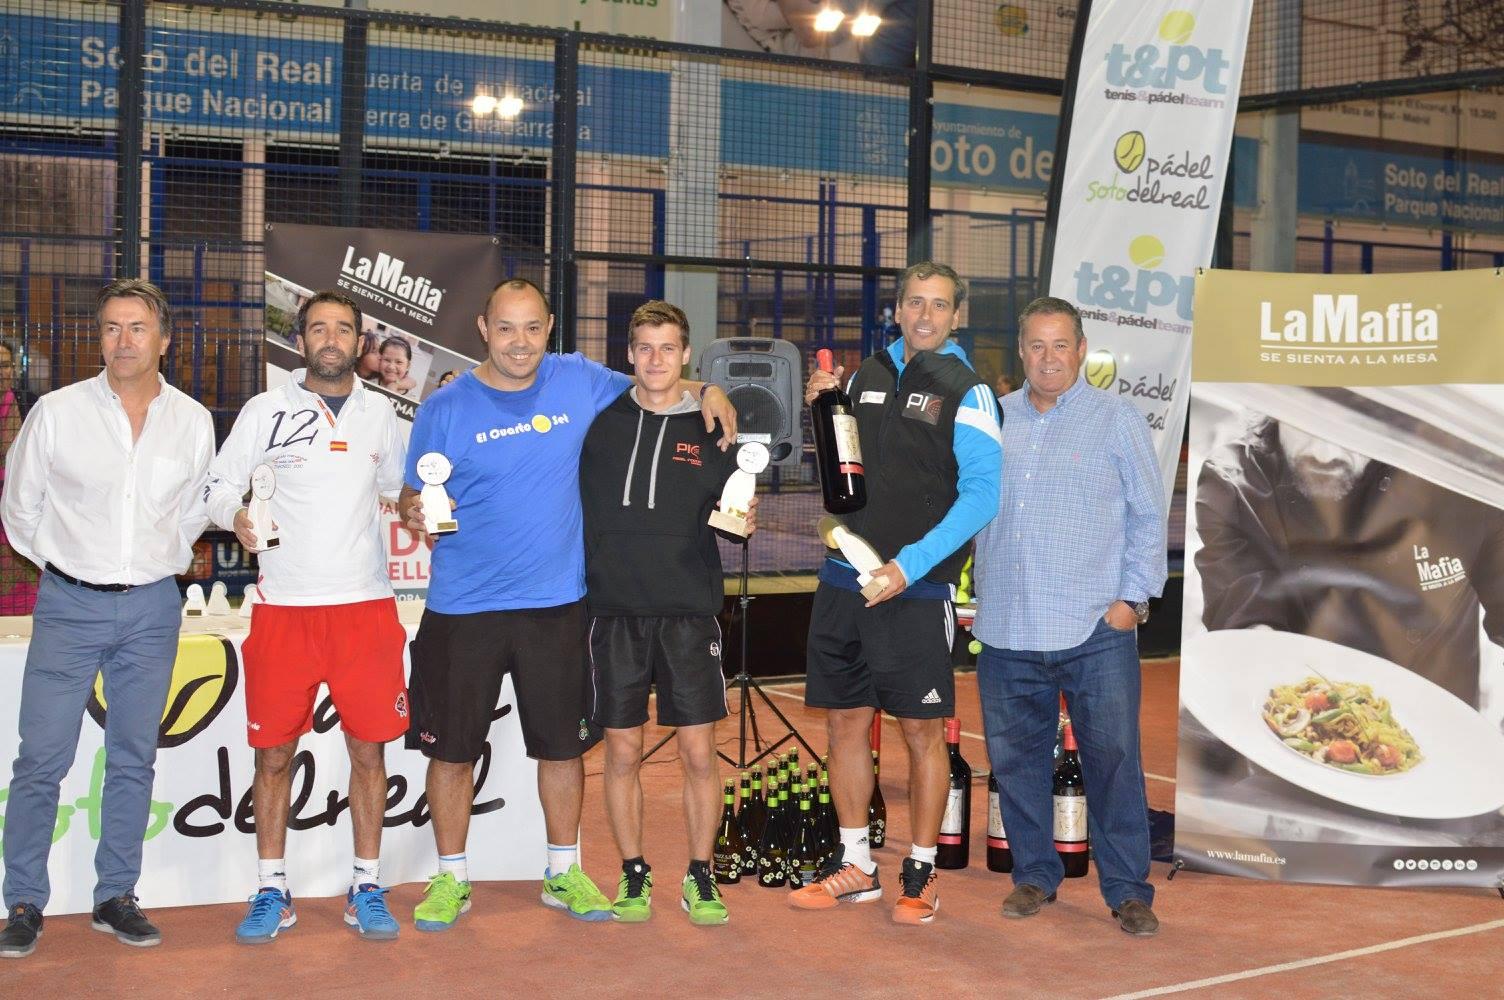 14556580 320545031639798 1729491303234139974 o - La Mafia con el Deporte. Torneo de La Mafia Colmenar Viejo.